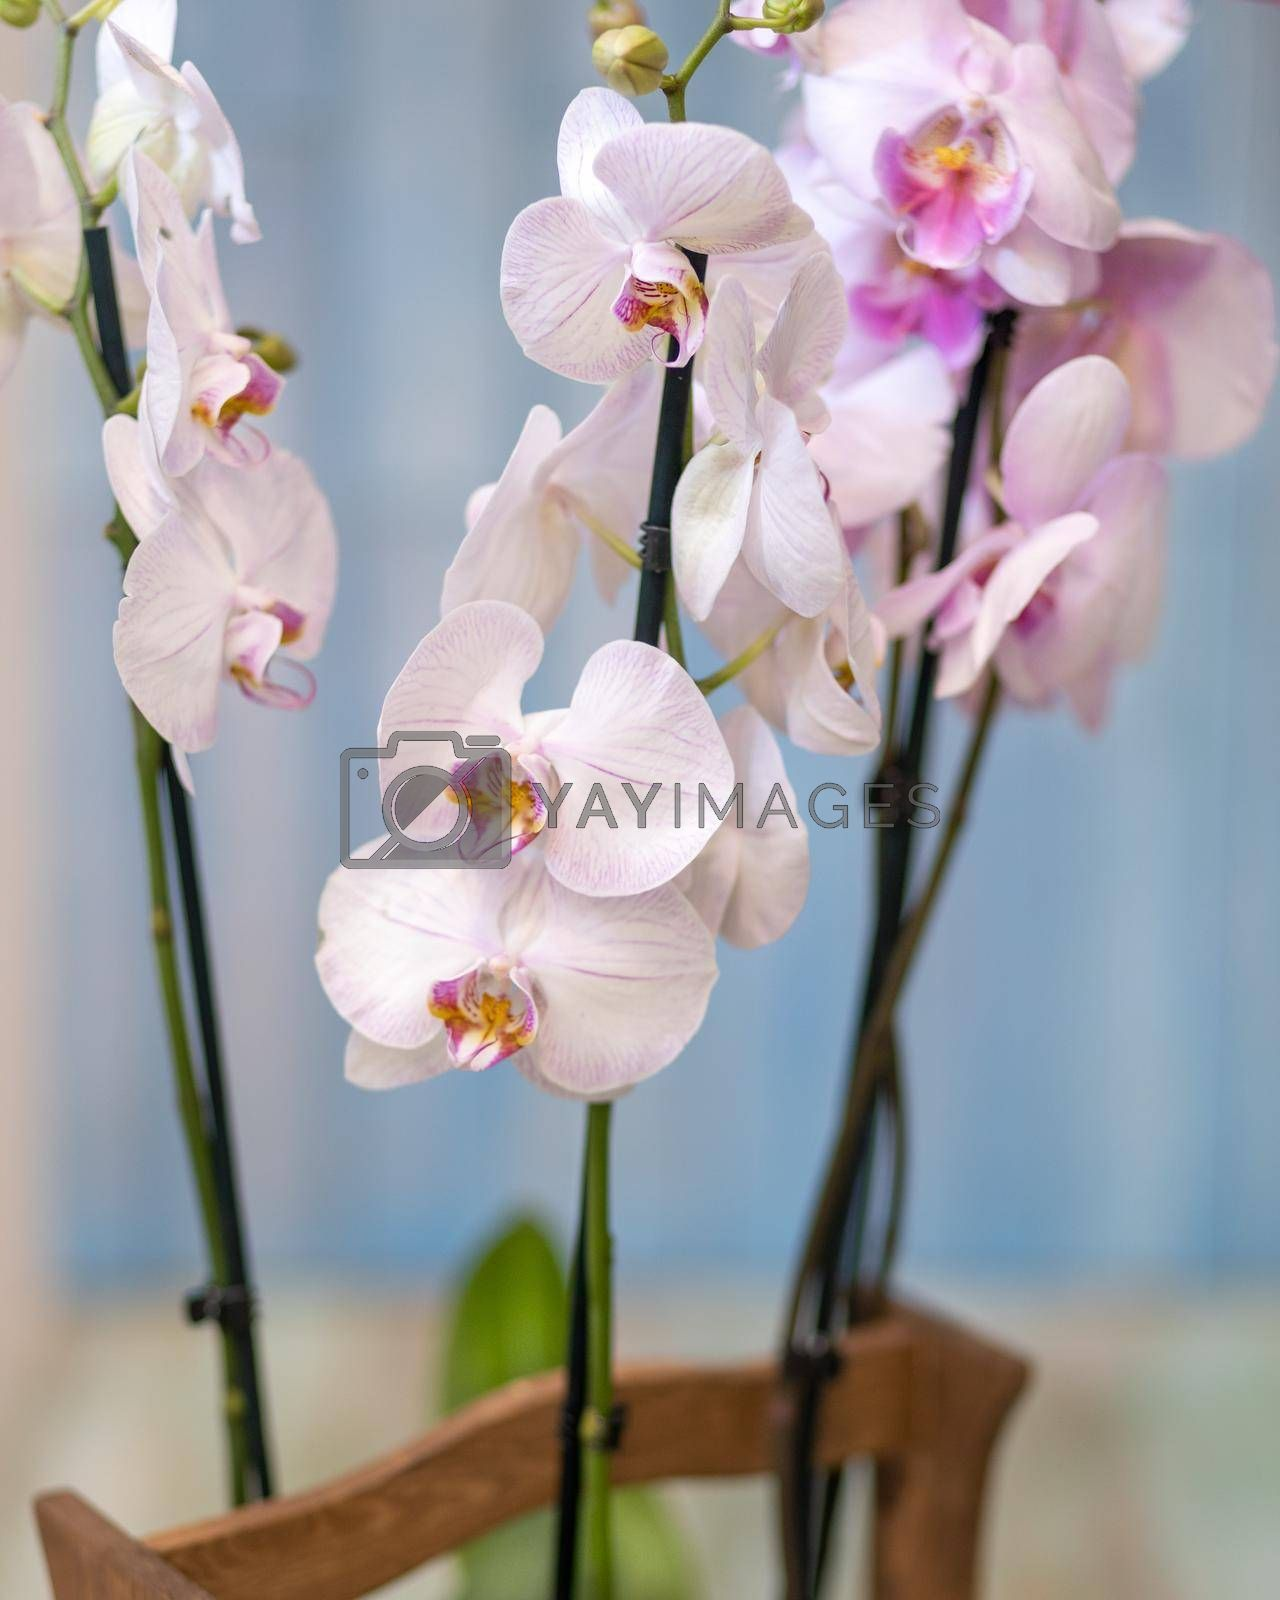 Phalaenopsist moth orchid close up